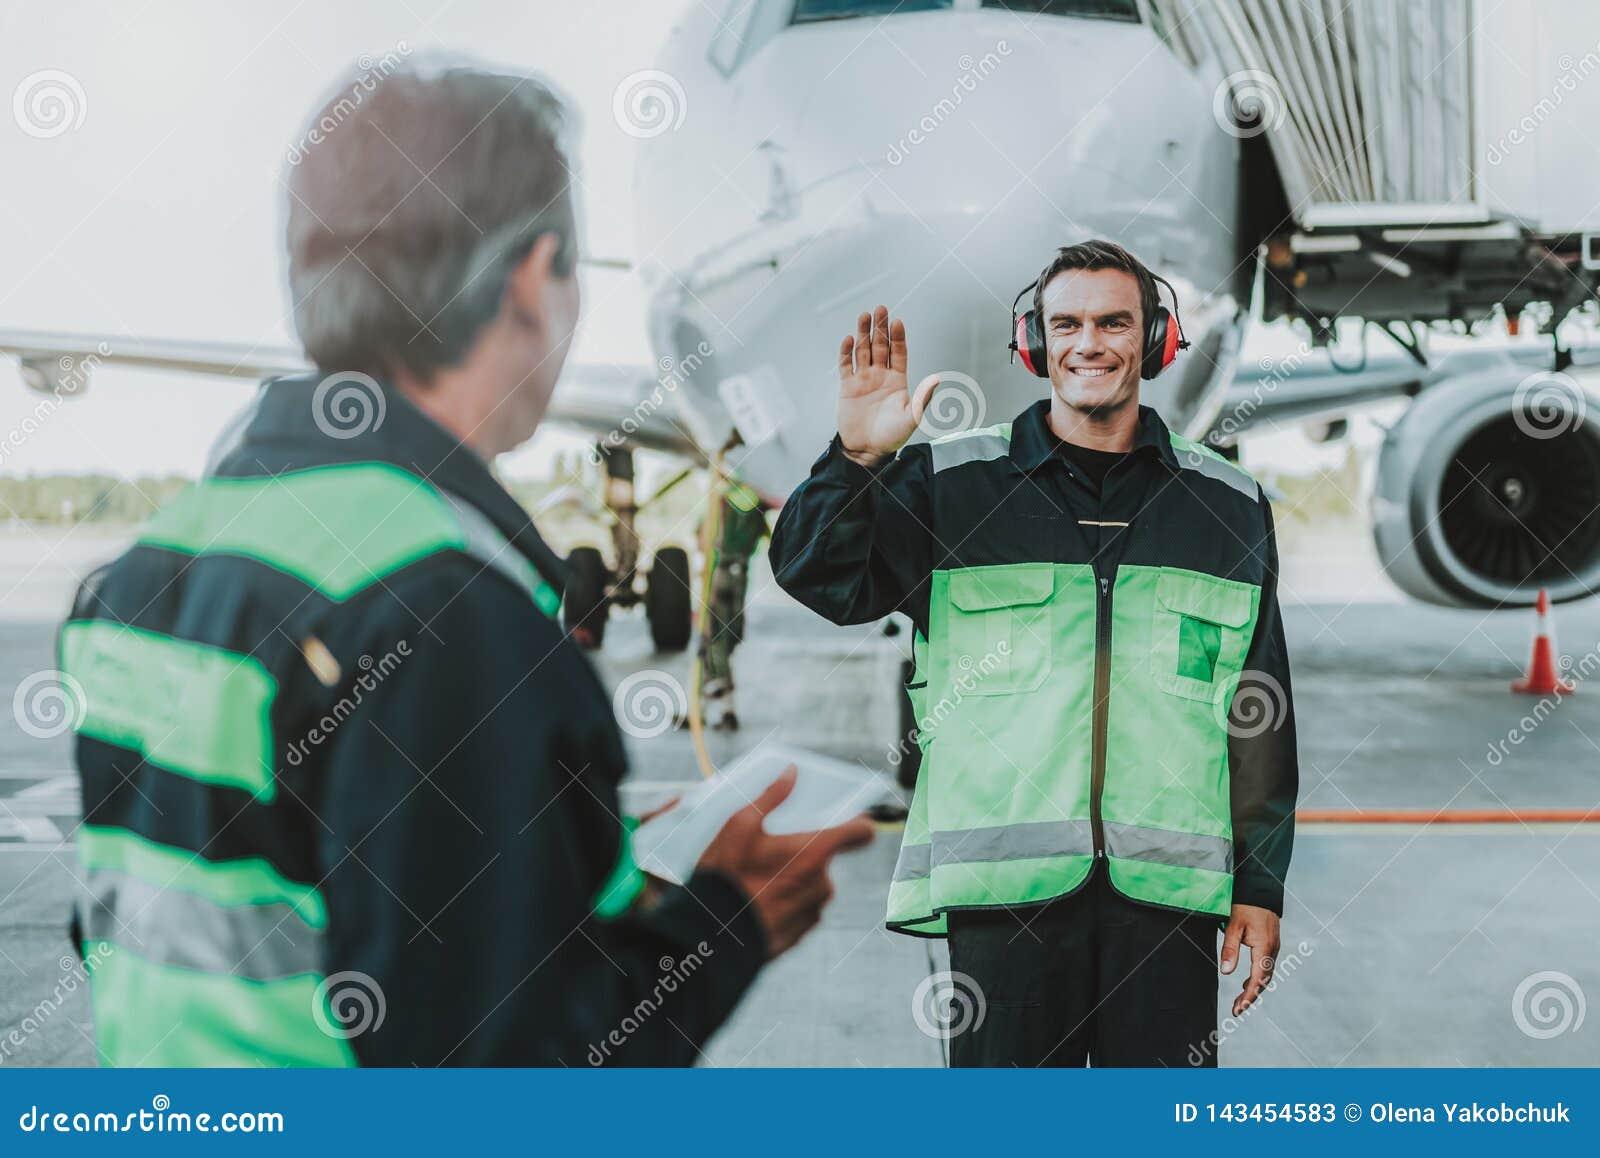 Smiling handsome employee in red headphone waving hands to mechanic